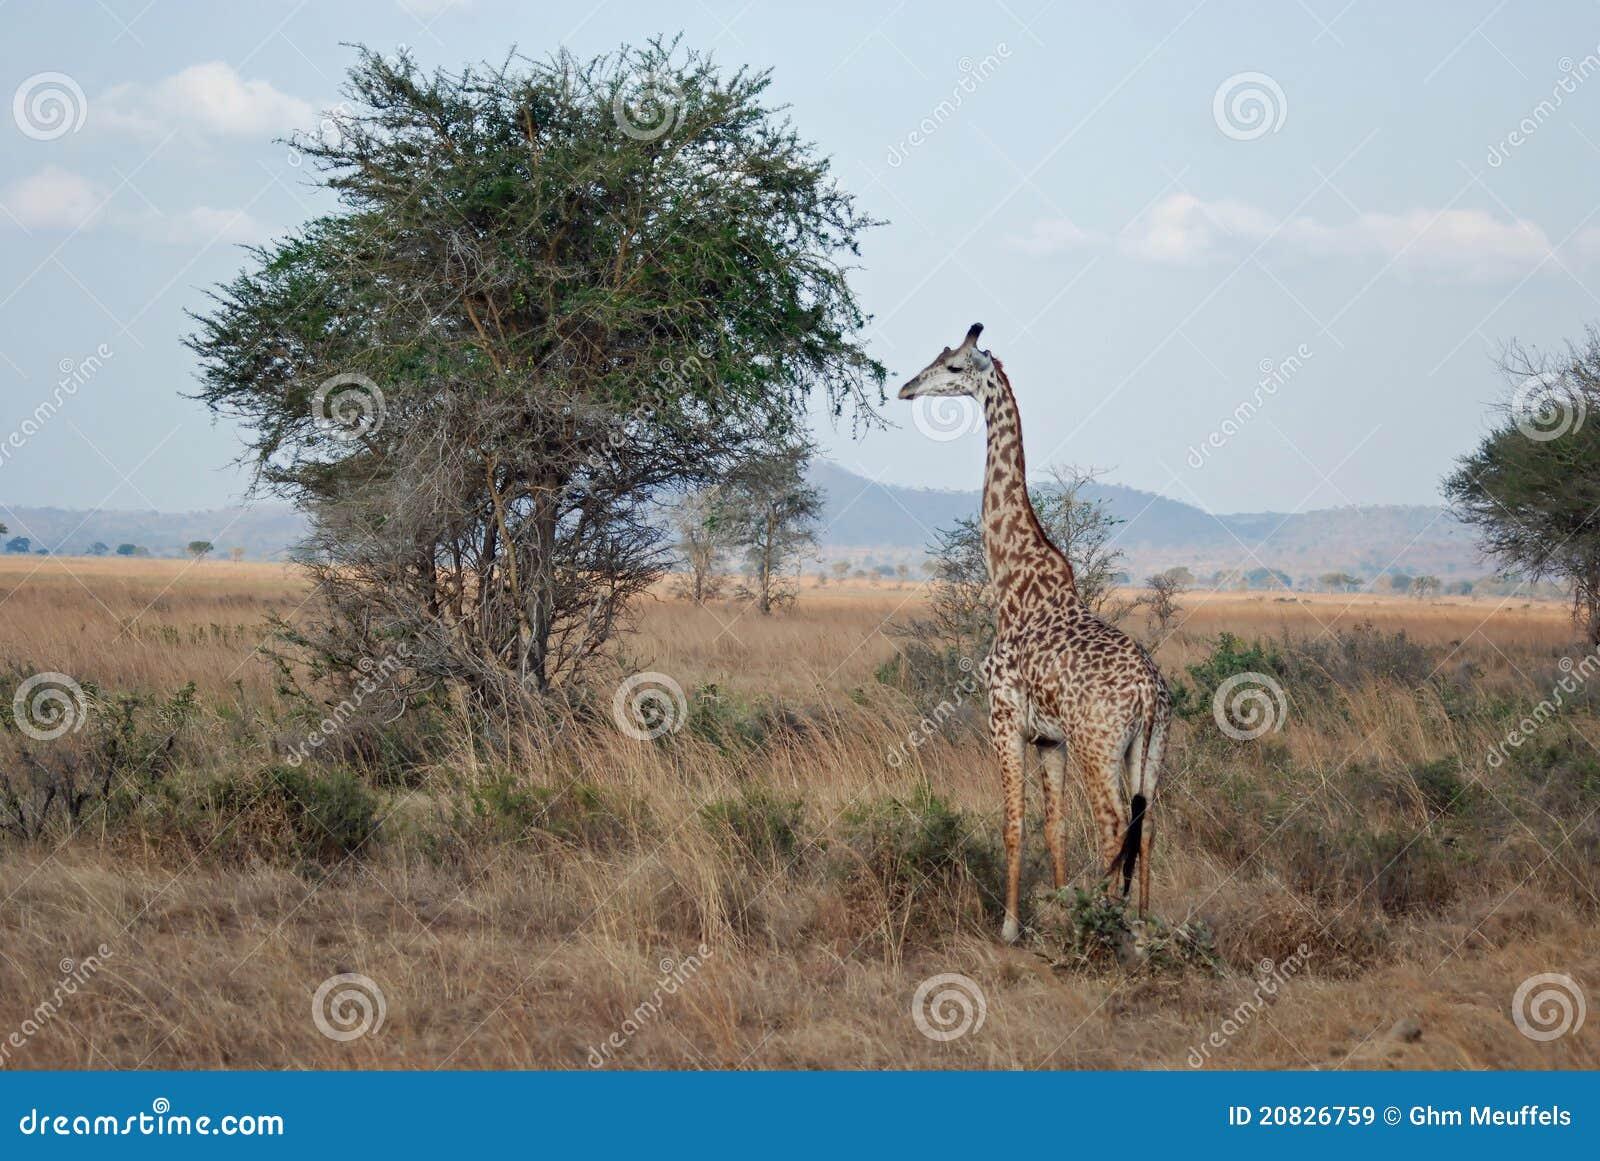 African savannah with Masai Giraffe - acacia tree